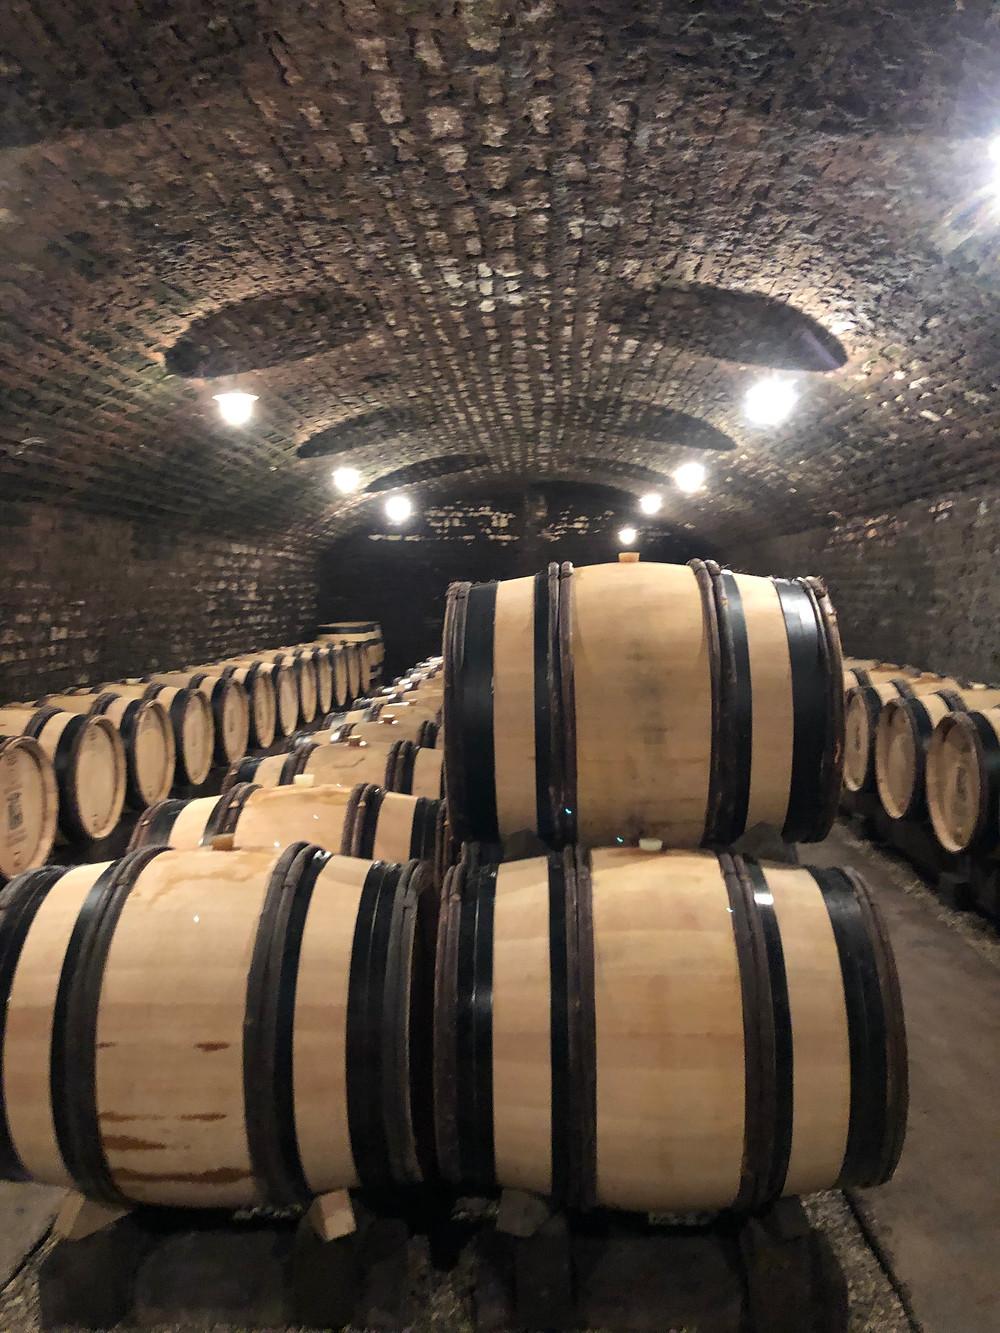 Oak barrels with wine in the underground cellar in Meursault at Domaine Jean Marie Bouzereau